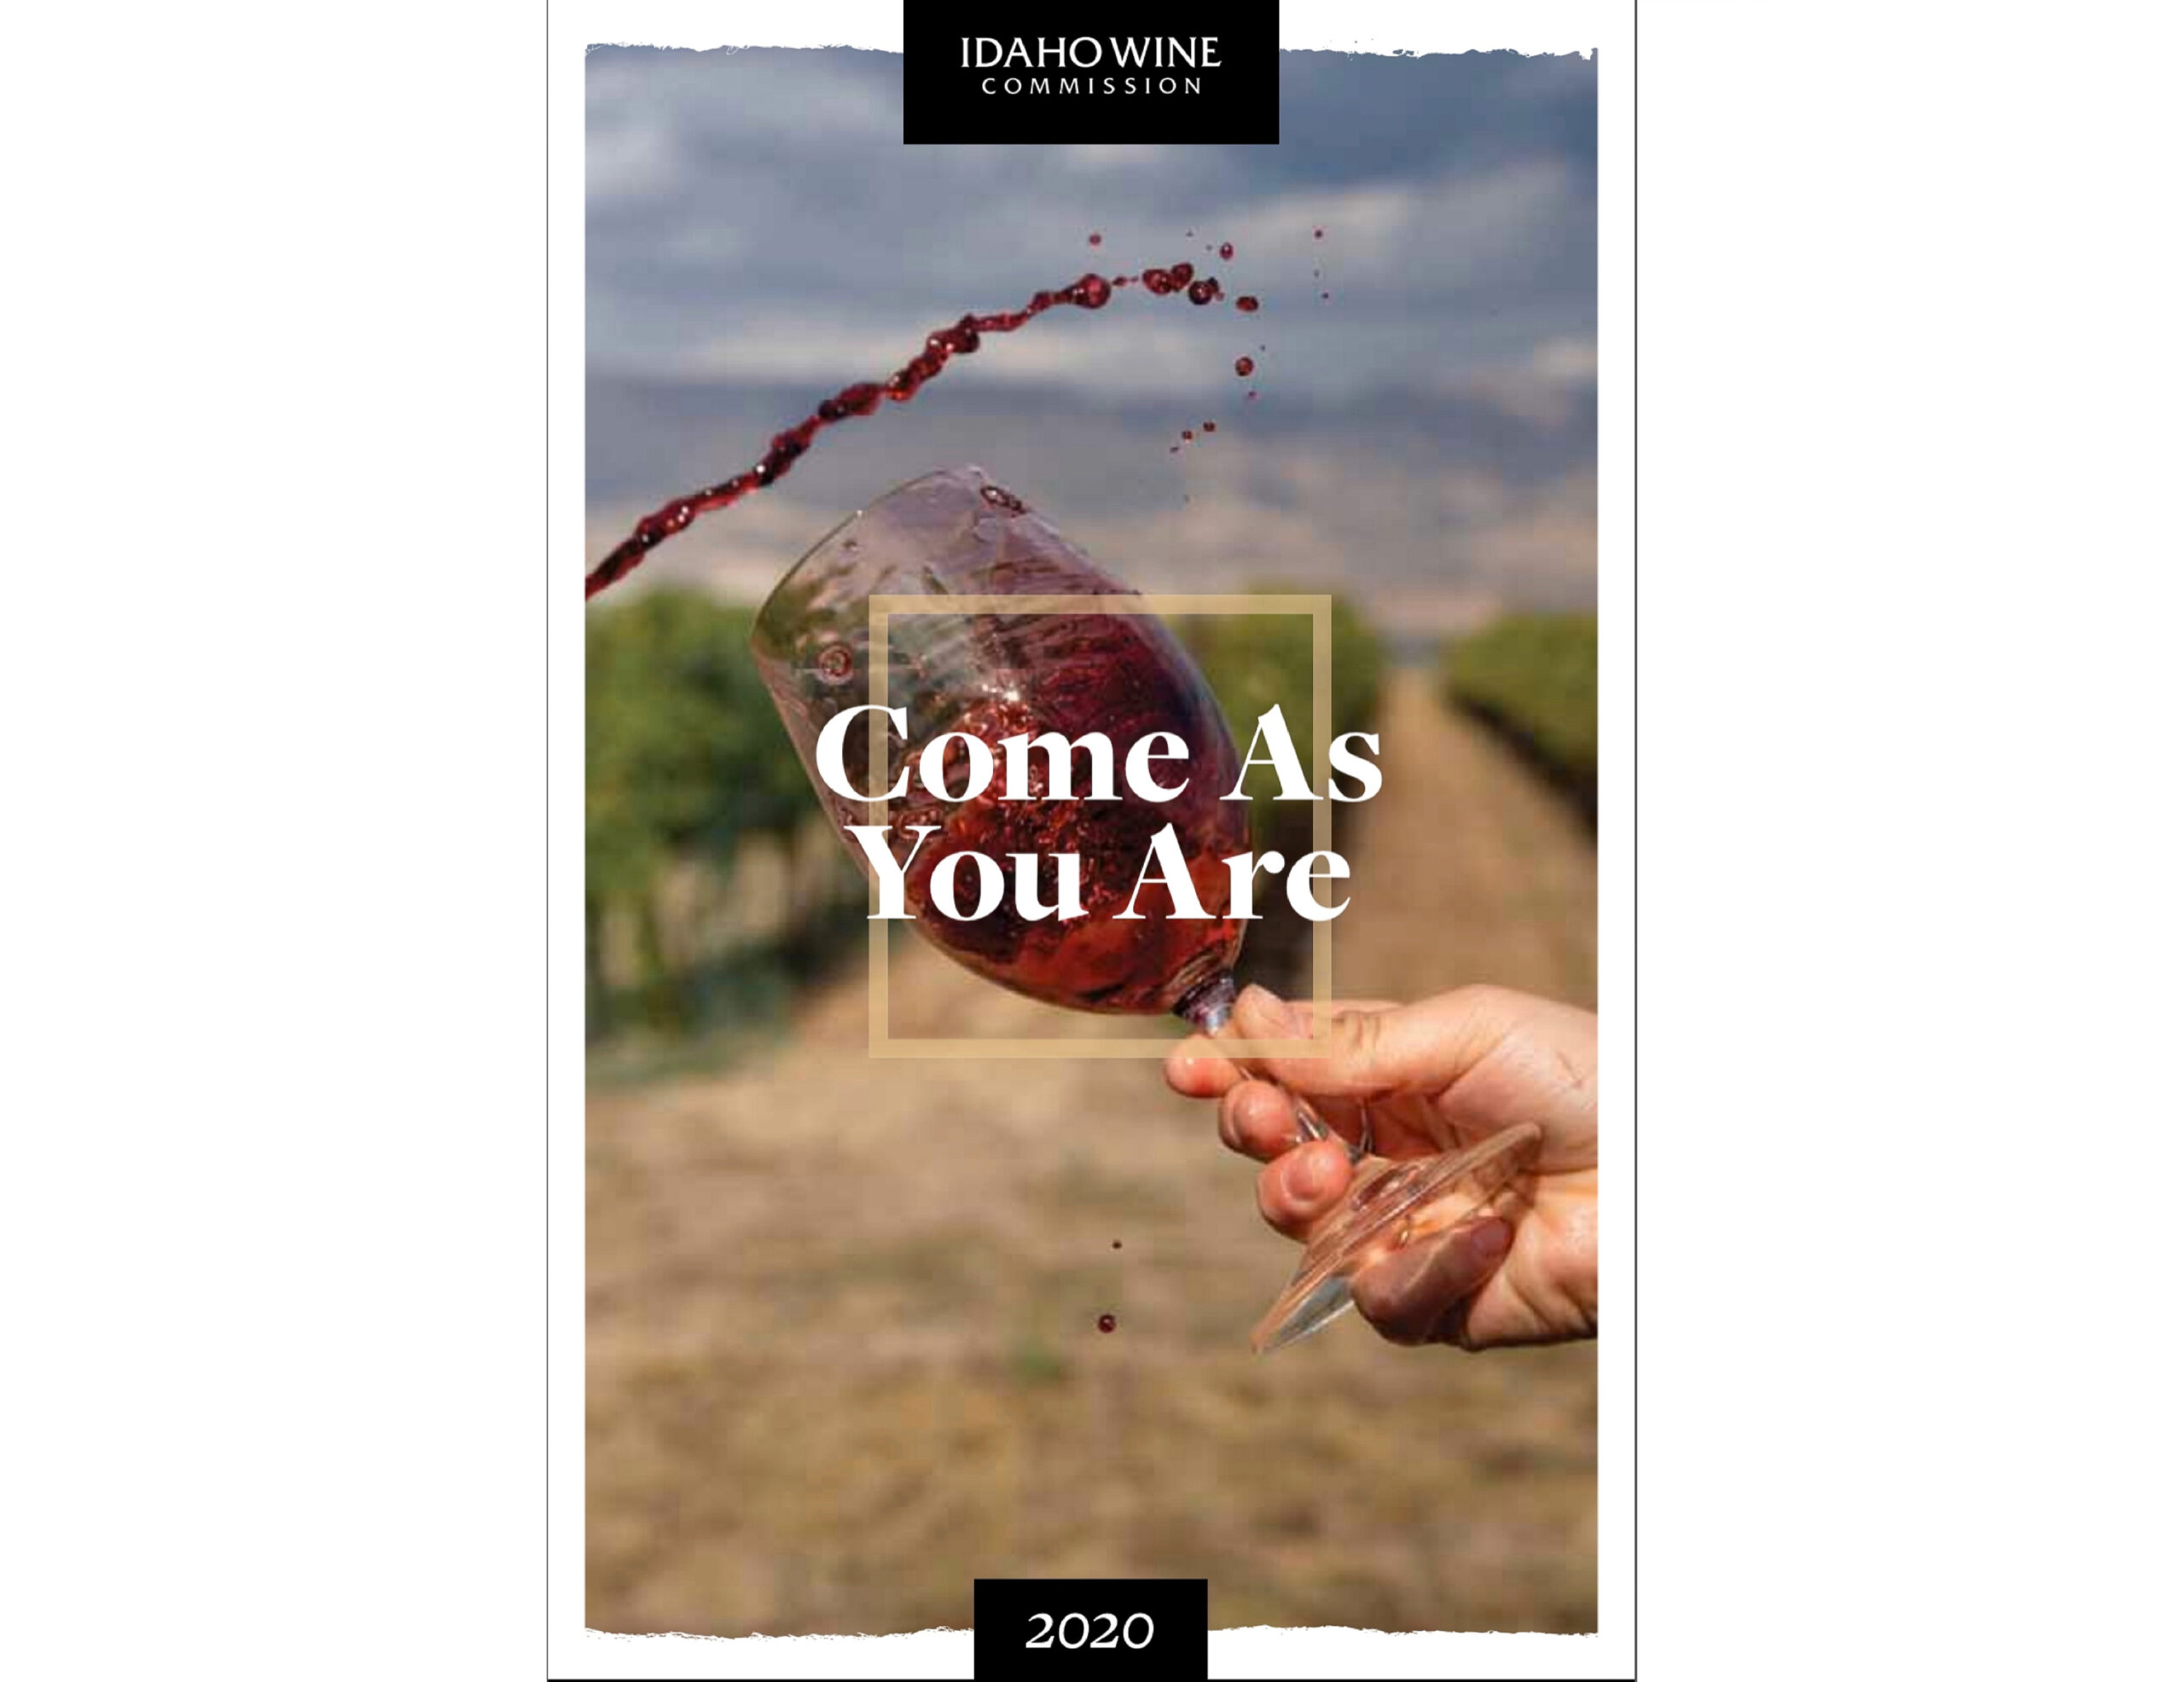 idaho_wine_commission_2020